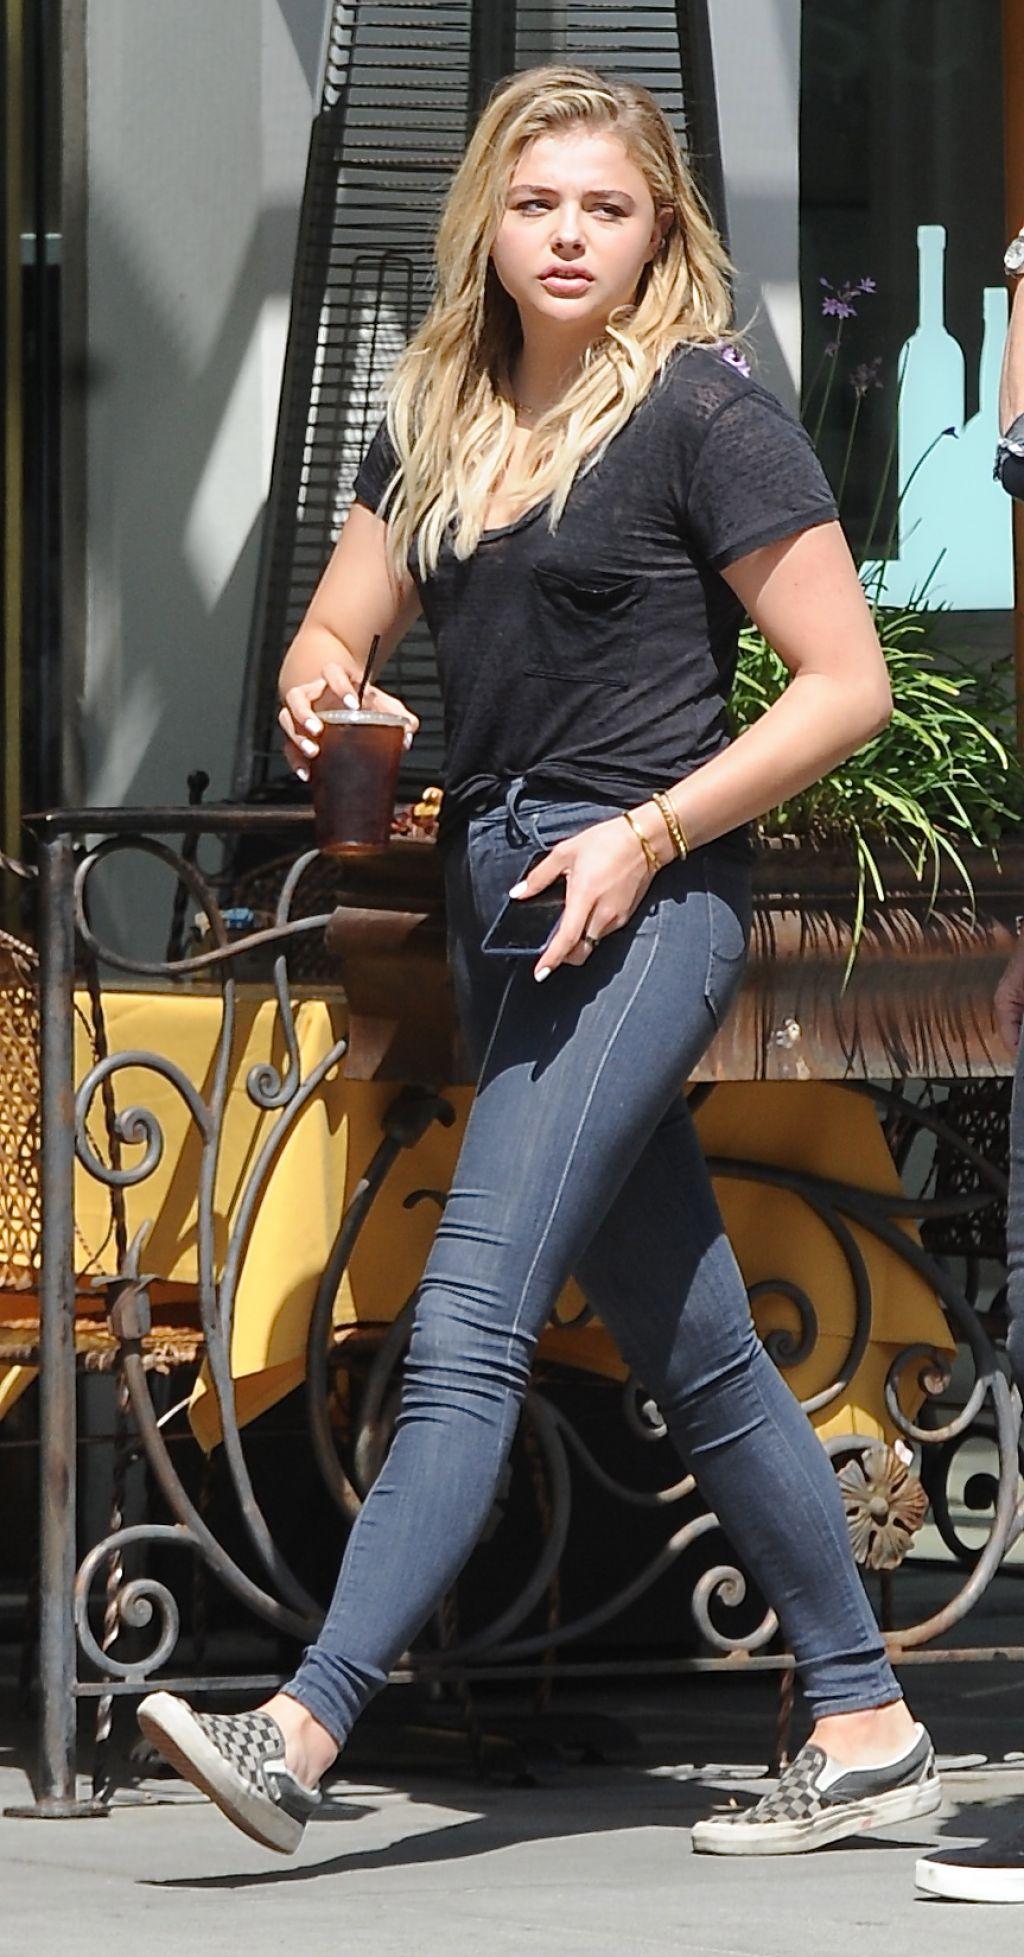 Chloe Moretz Street Style - Out in NYC 5/7/2016 • CelebMafia